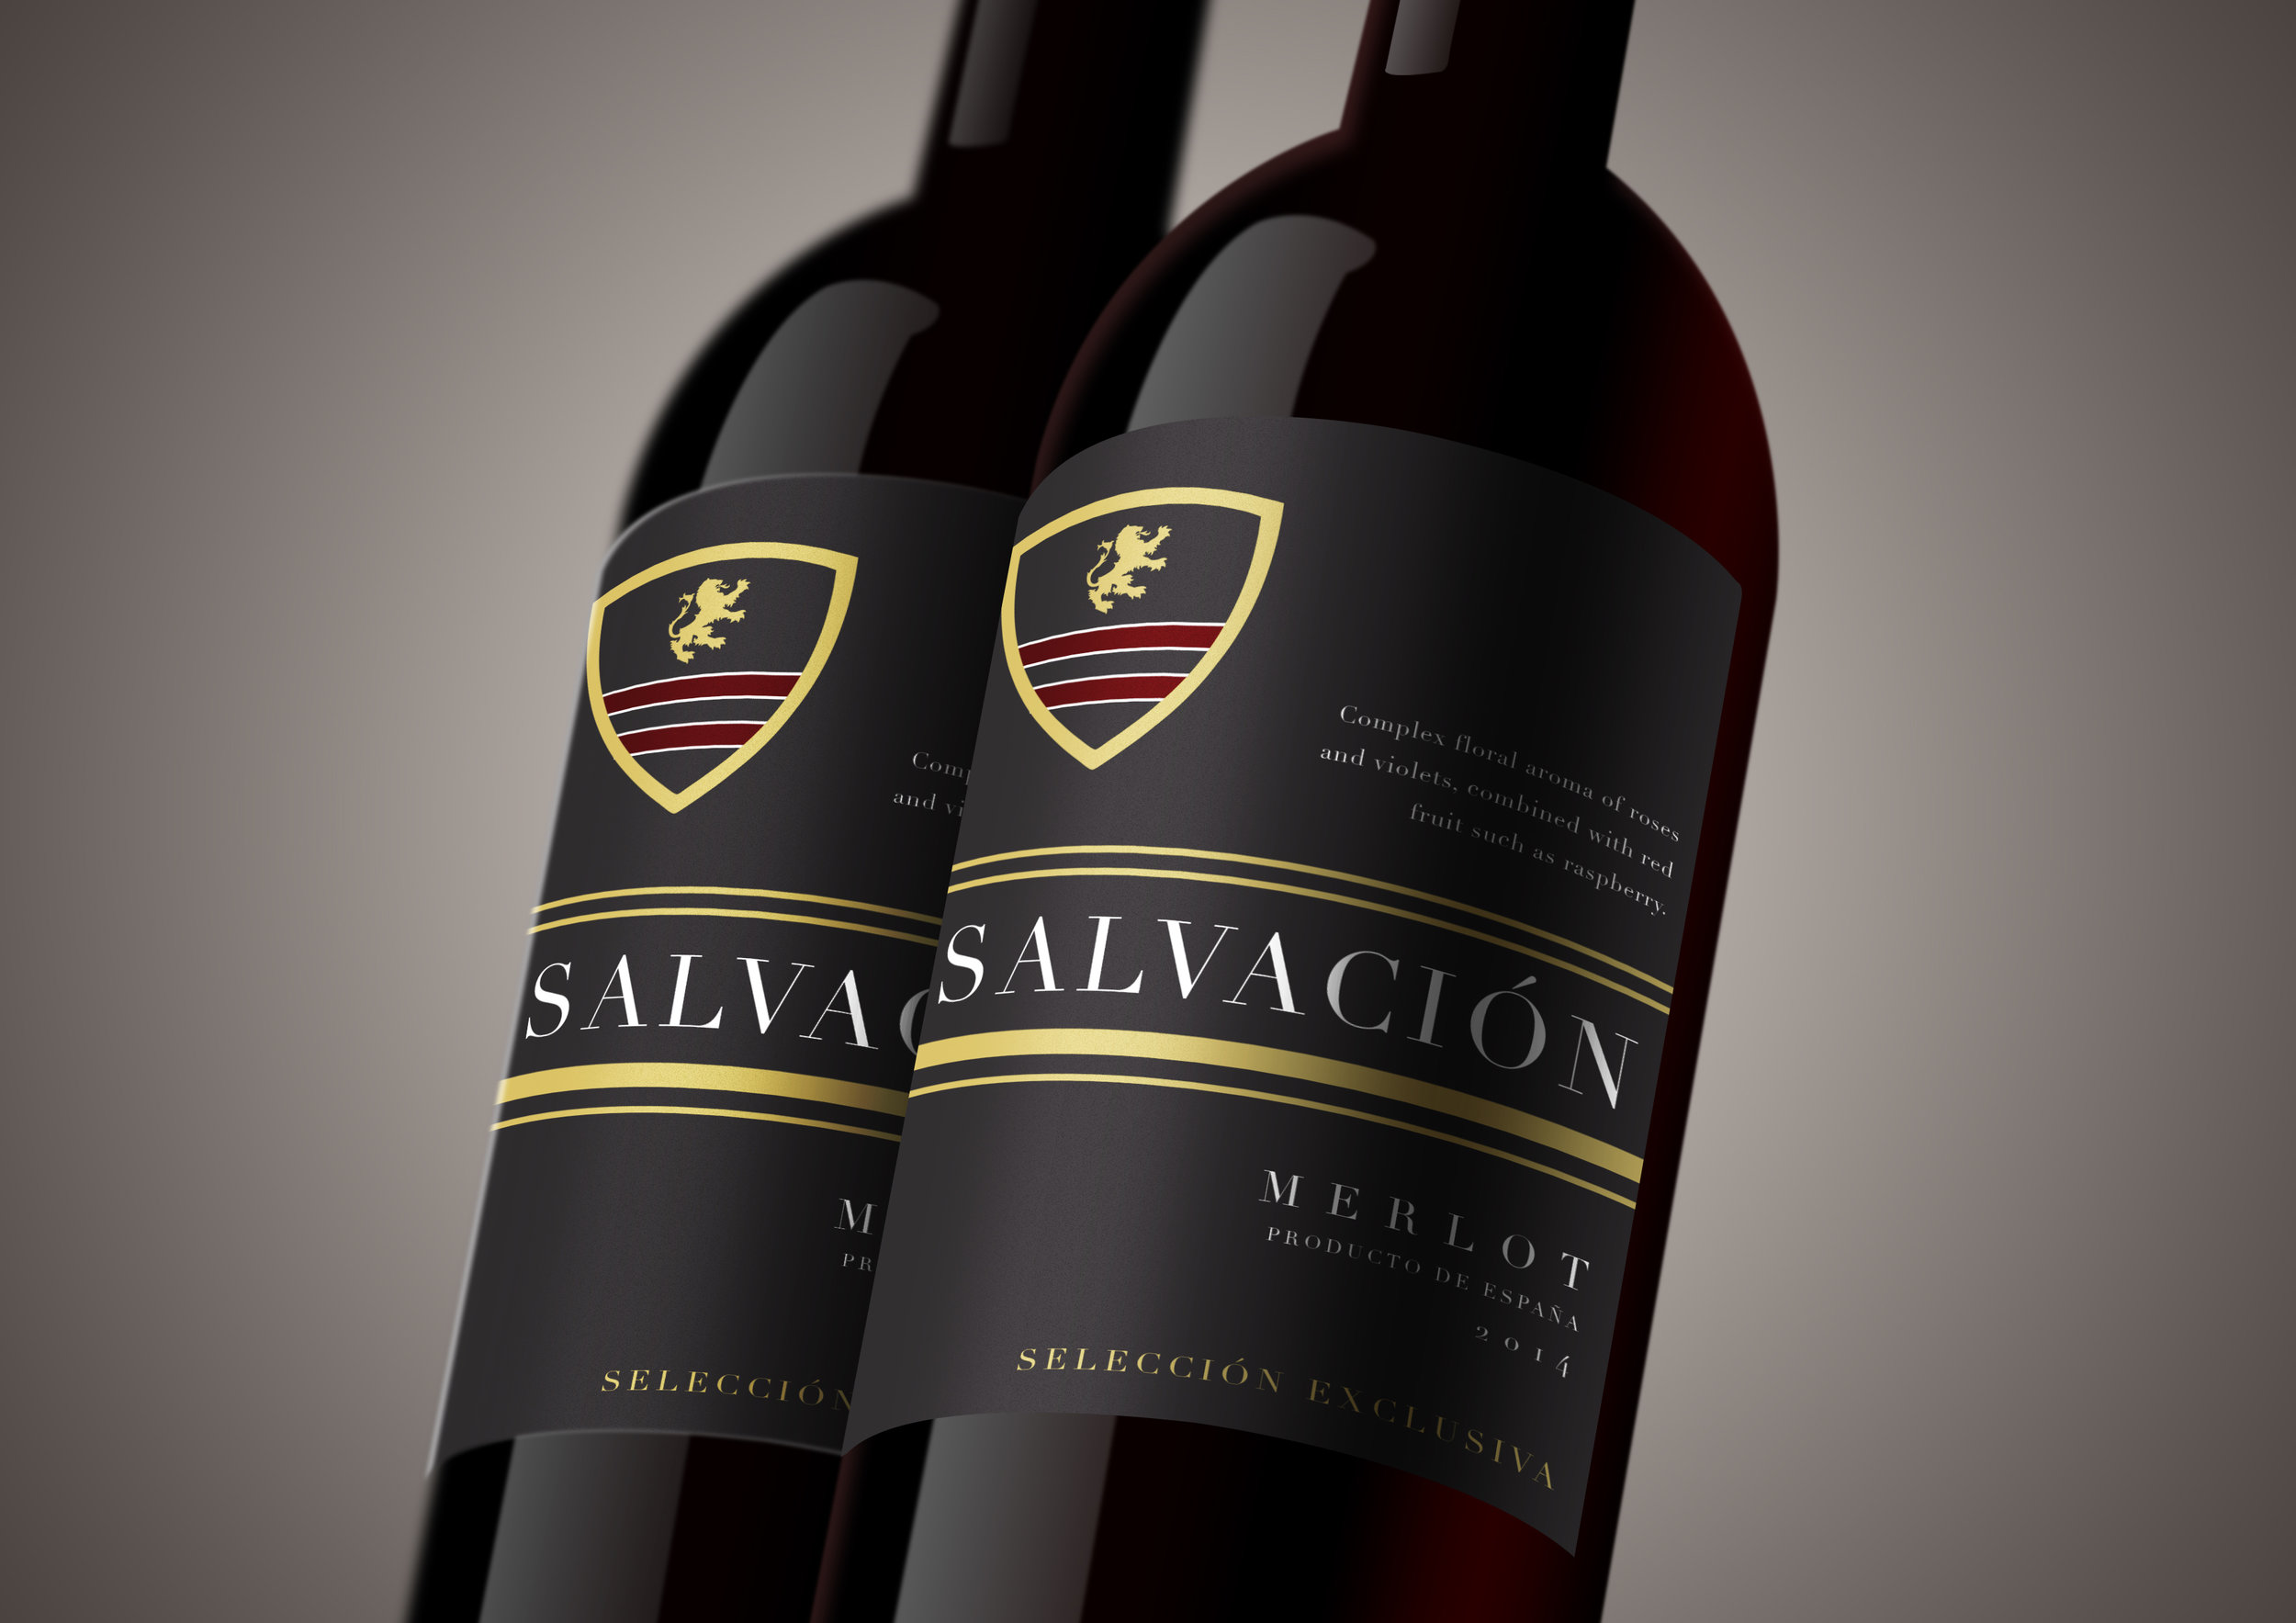 Salvacion 2 bottle shot.jpg